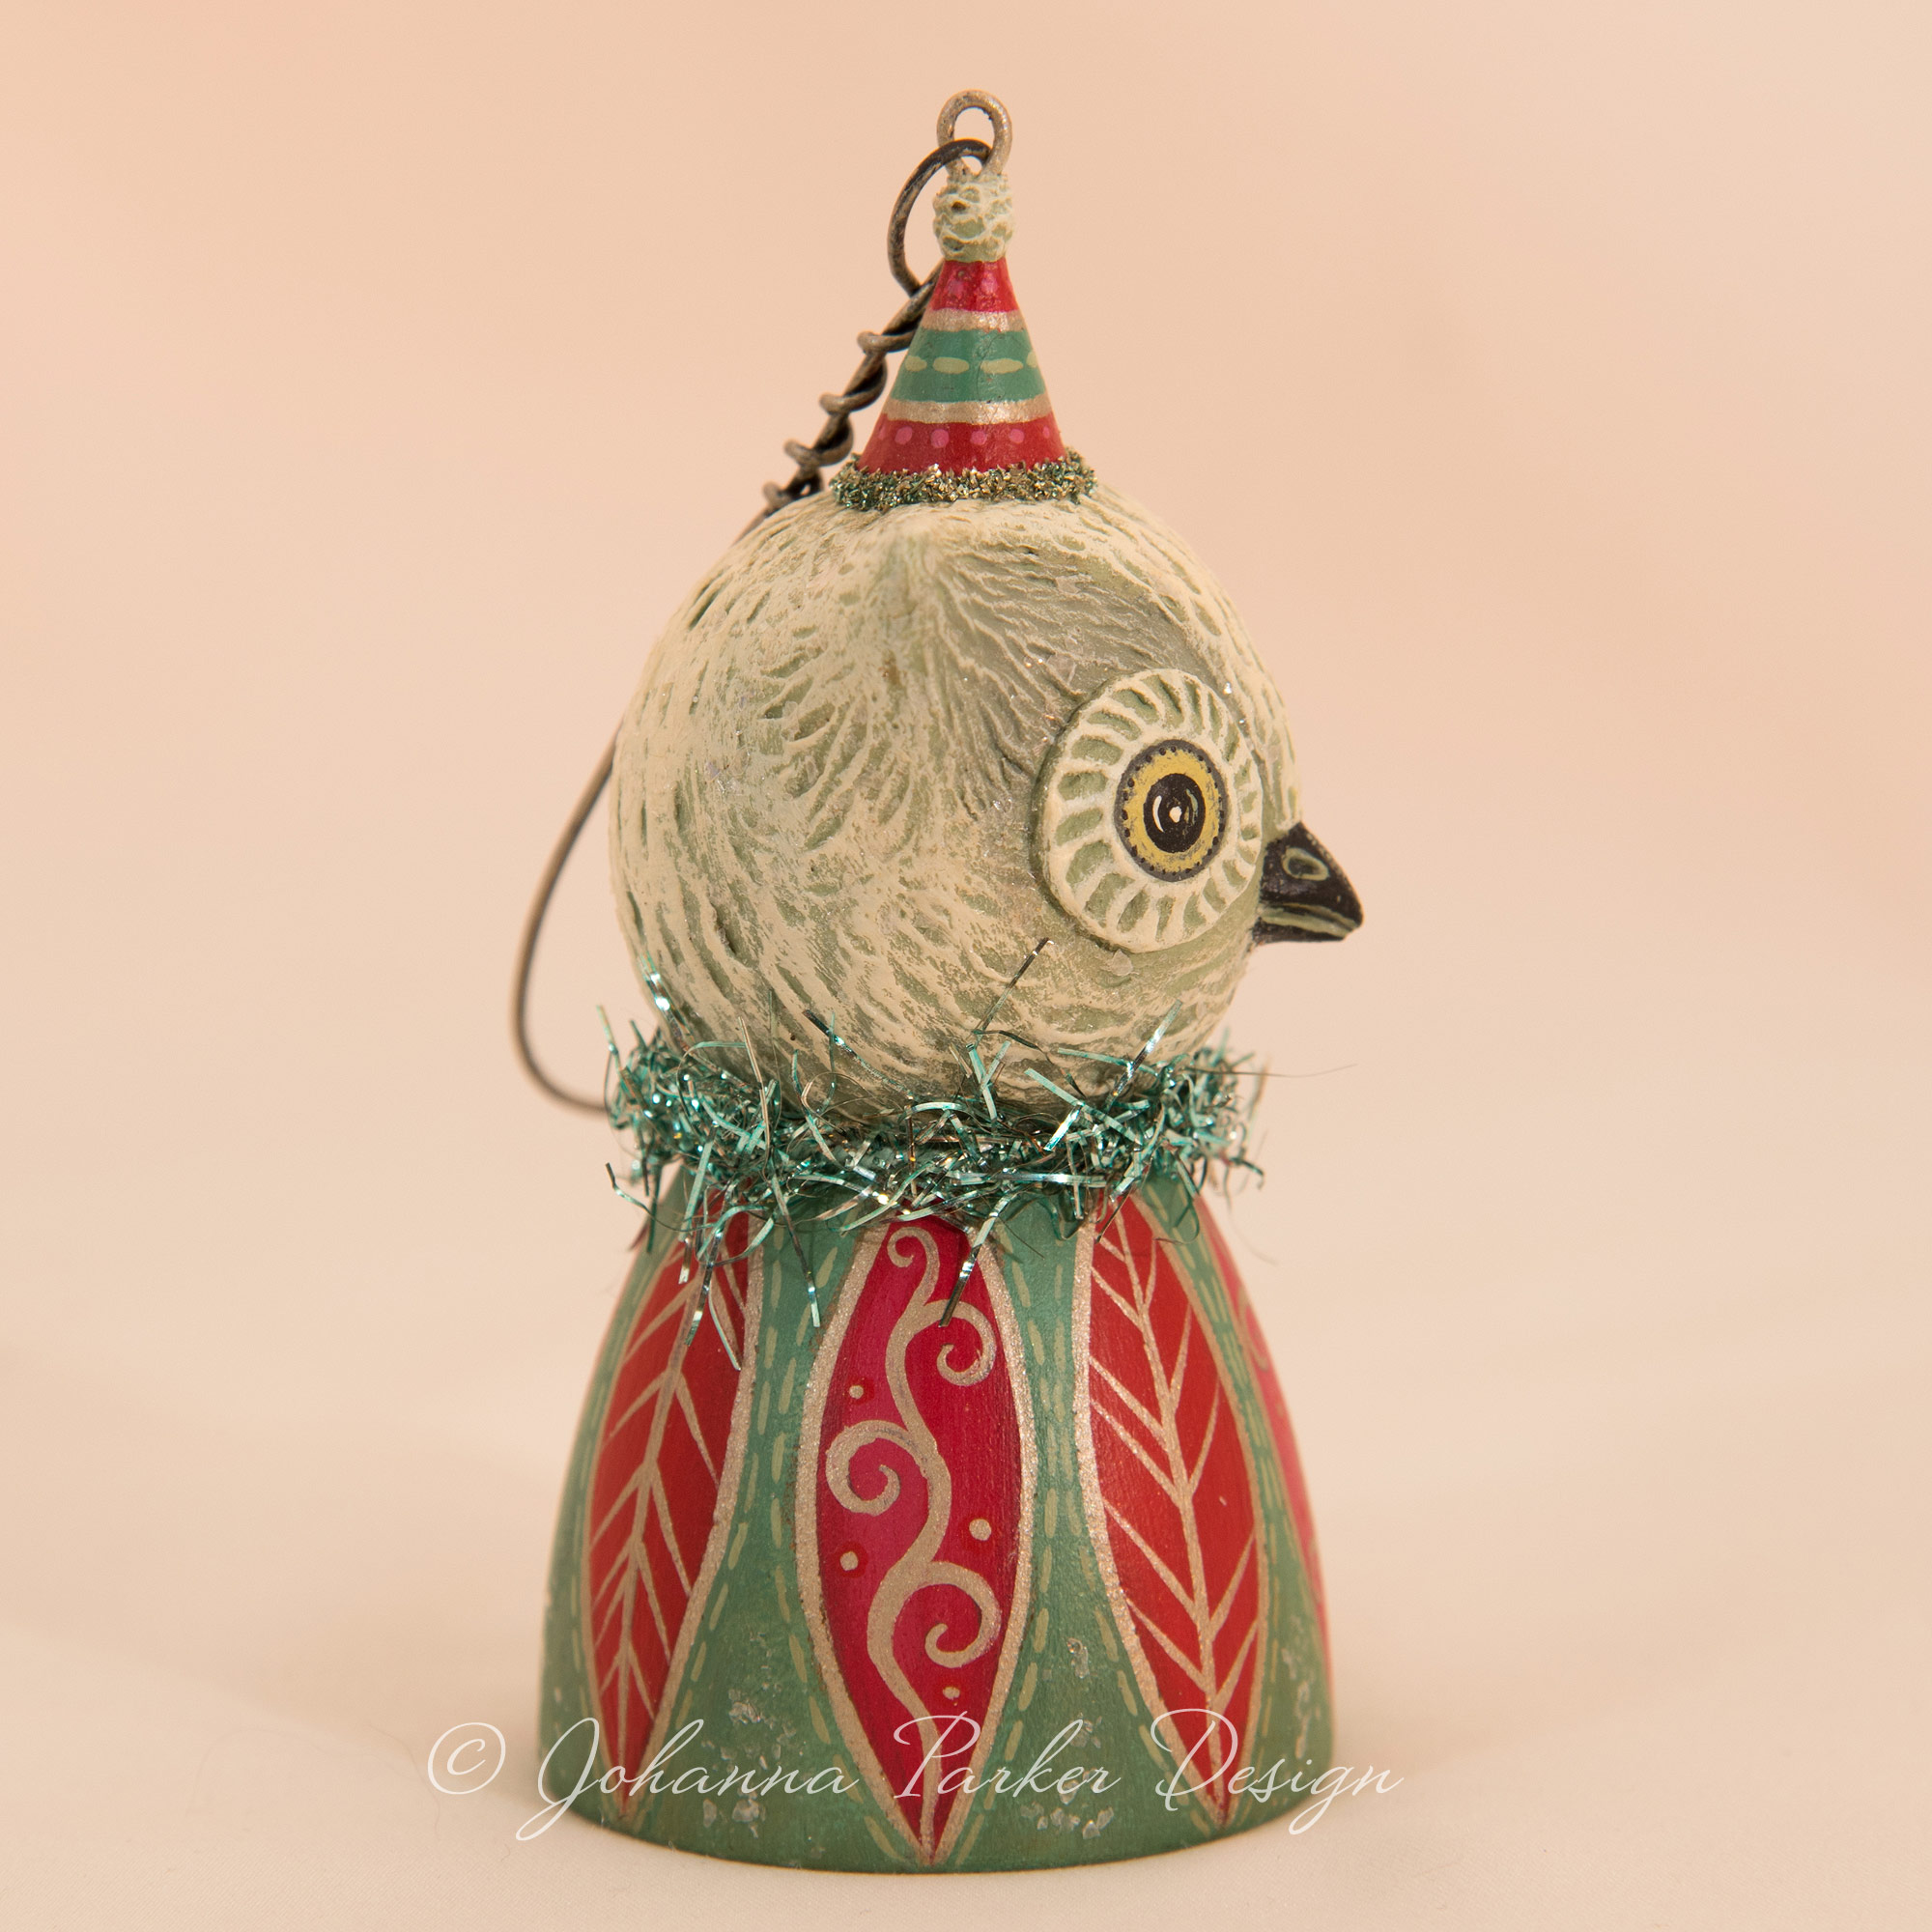 Johanna-Parker-Owl-Feathers-Bell-Ornament-3.jpg